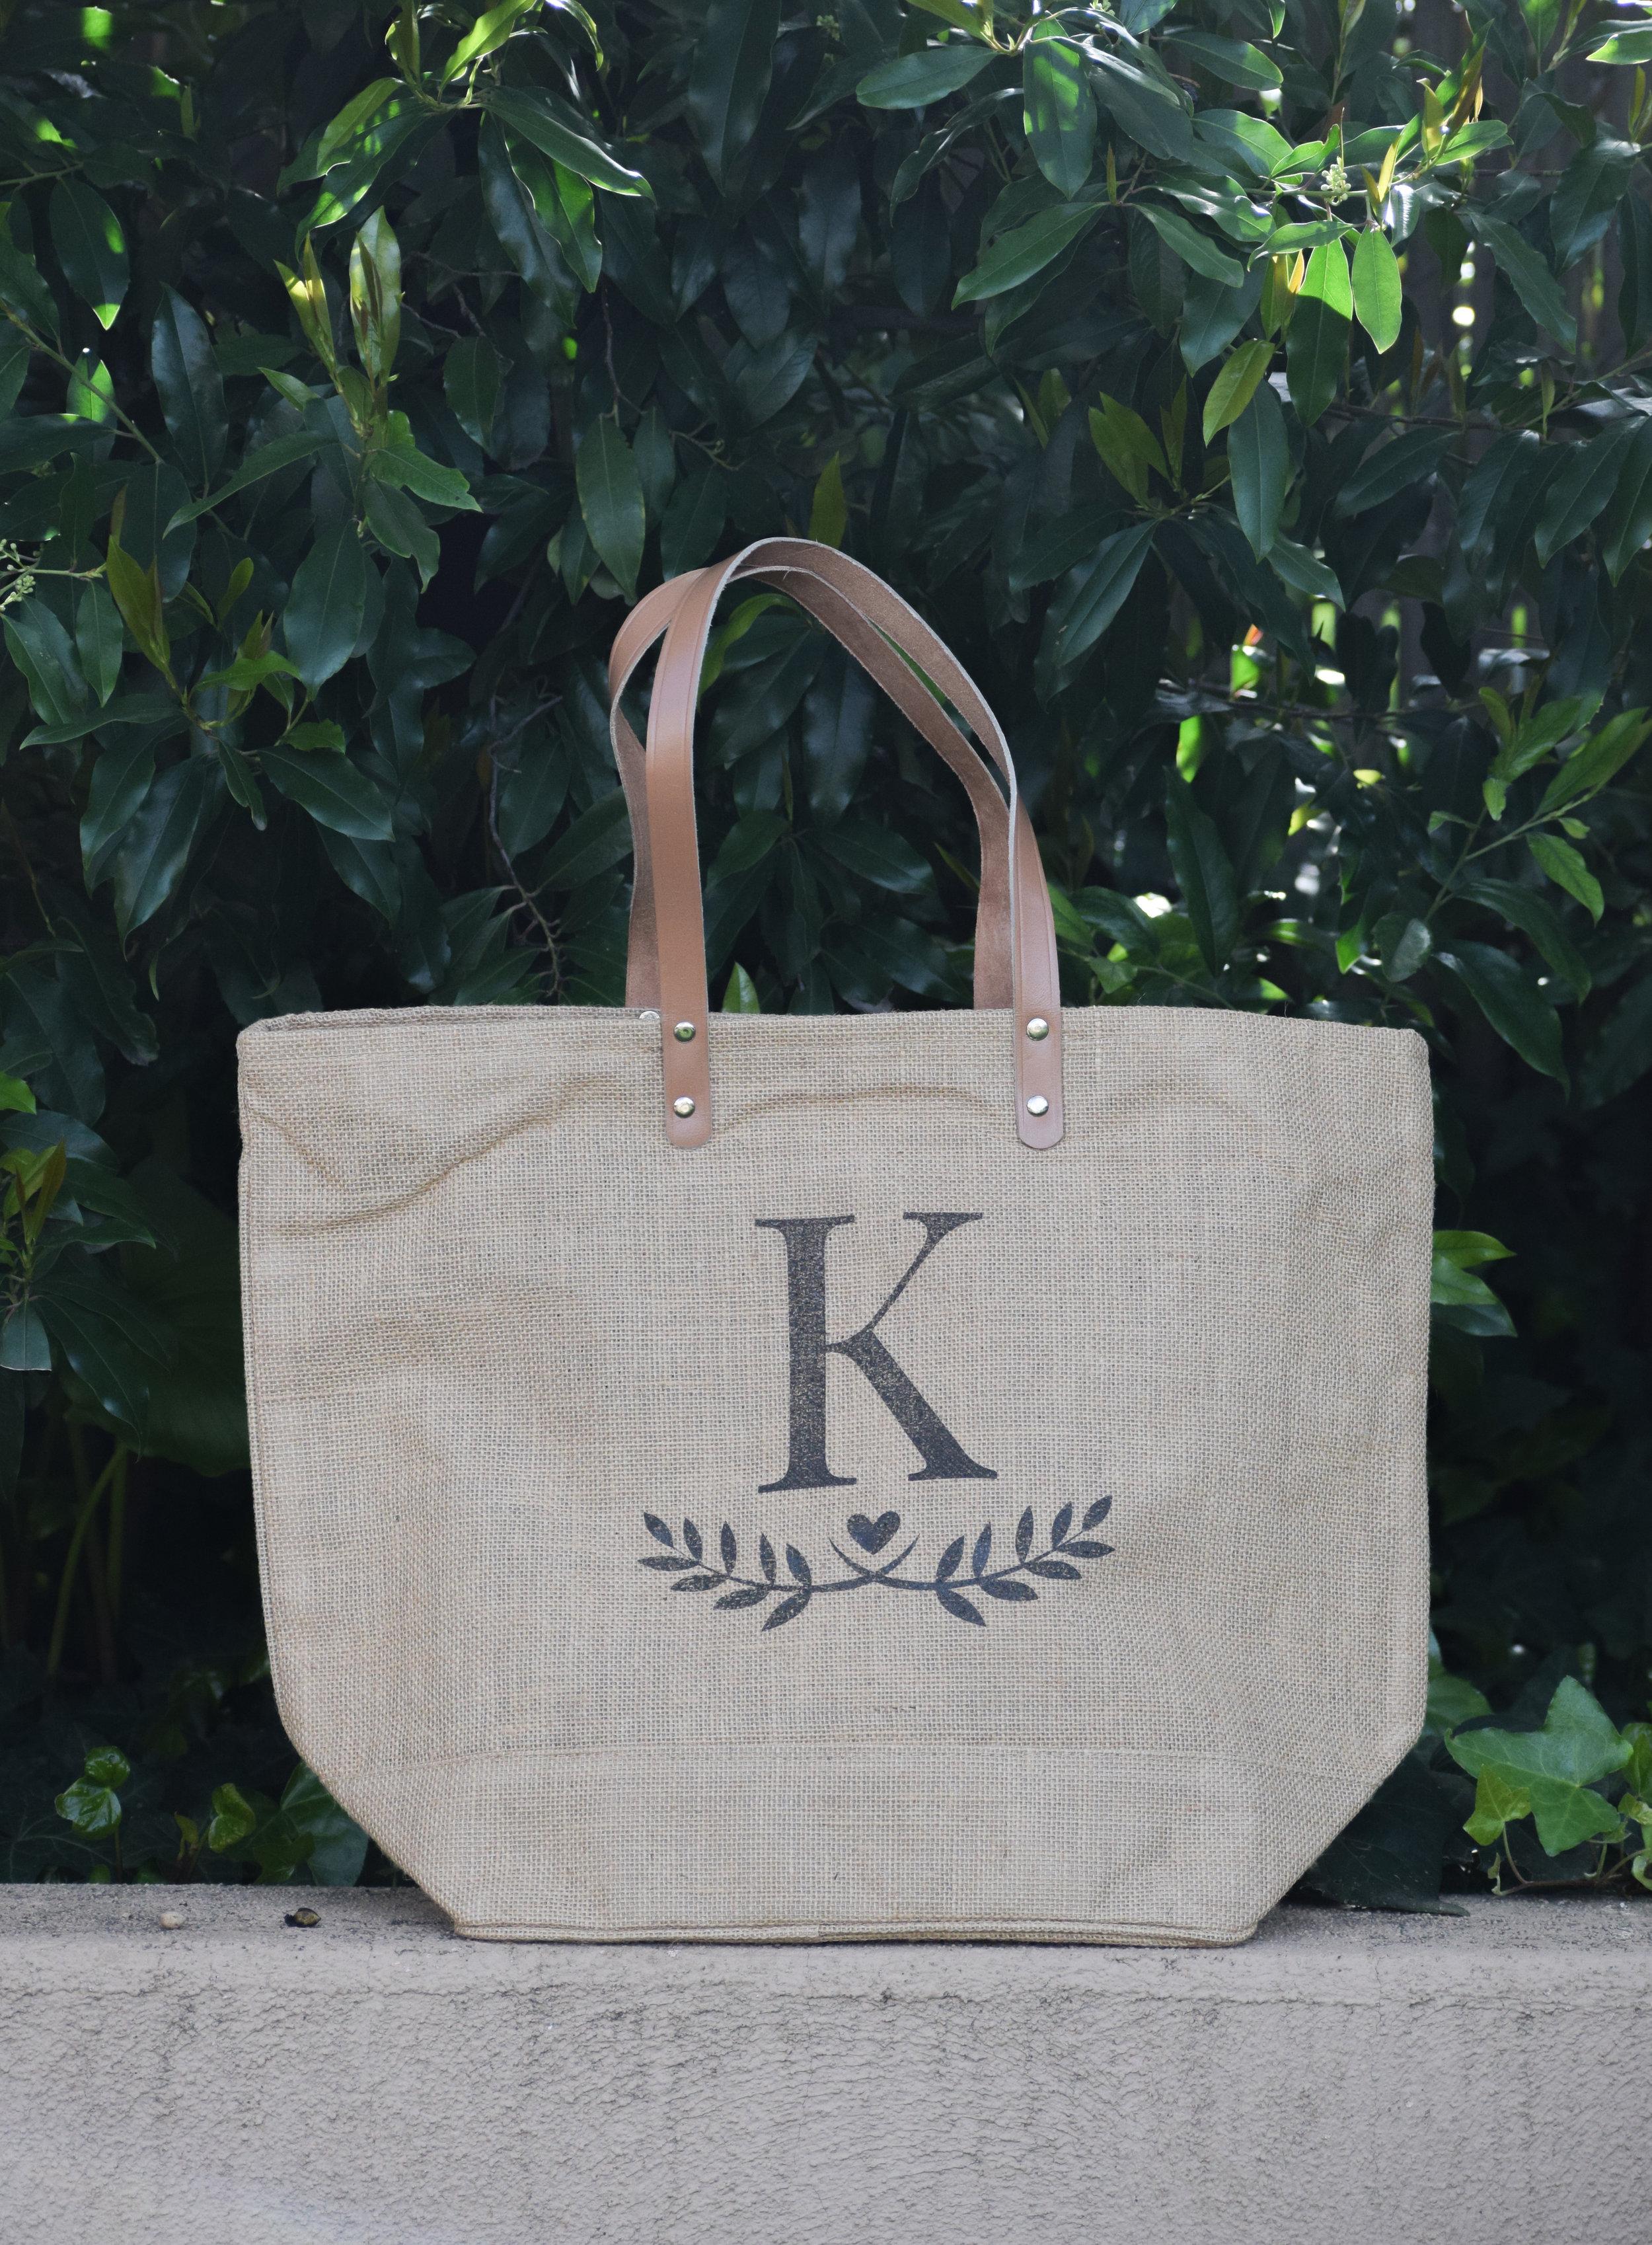 The Bridal Boutique - Burlap Bridesmaid Tote - Bridesmaid Gift Bags - Emma and the Bean